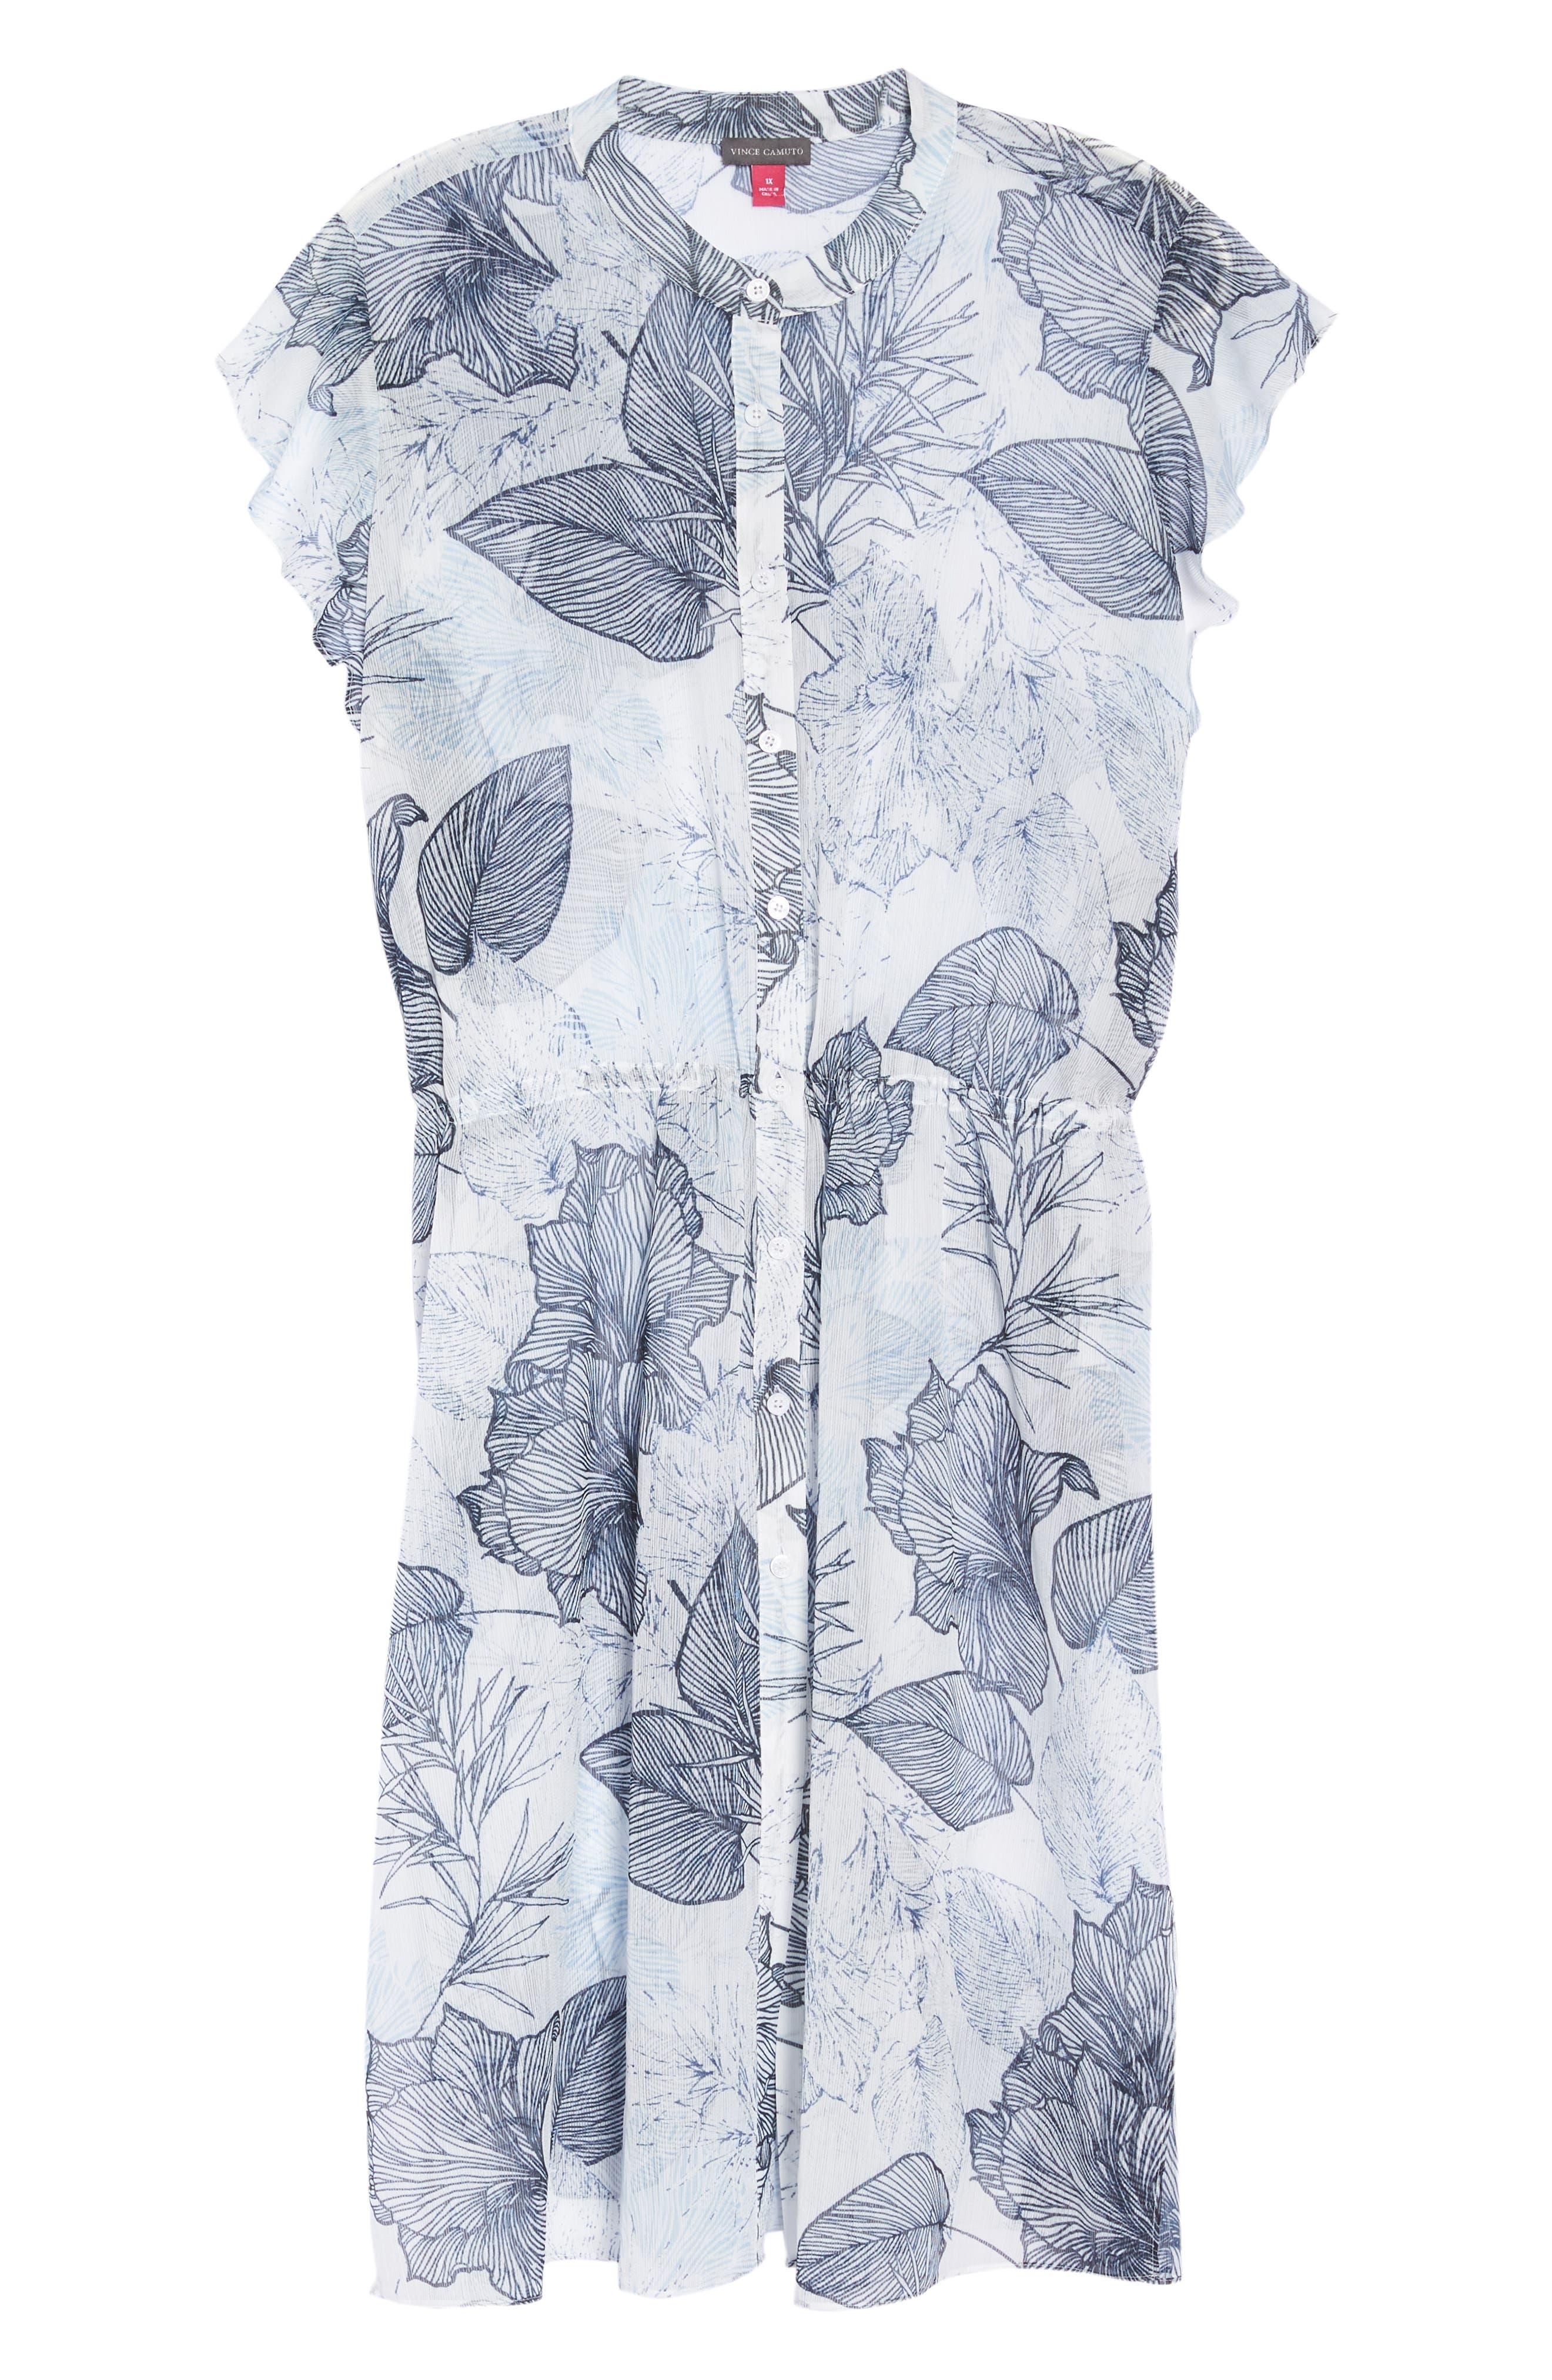 Flutter Sleeve Floral Chiffon Shirt Tunic,                             Alternate thumbnail 7, color,                             145